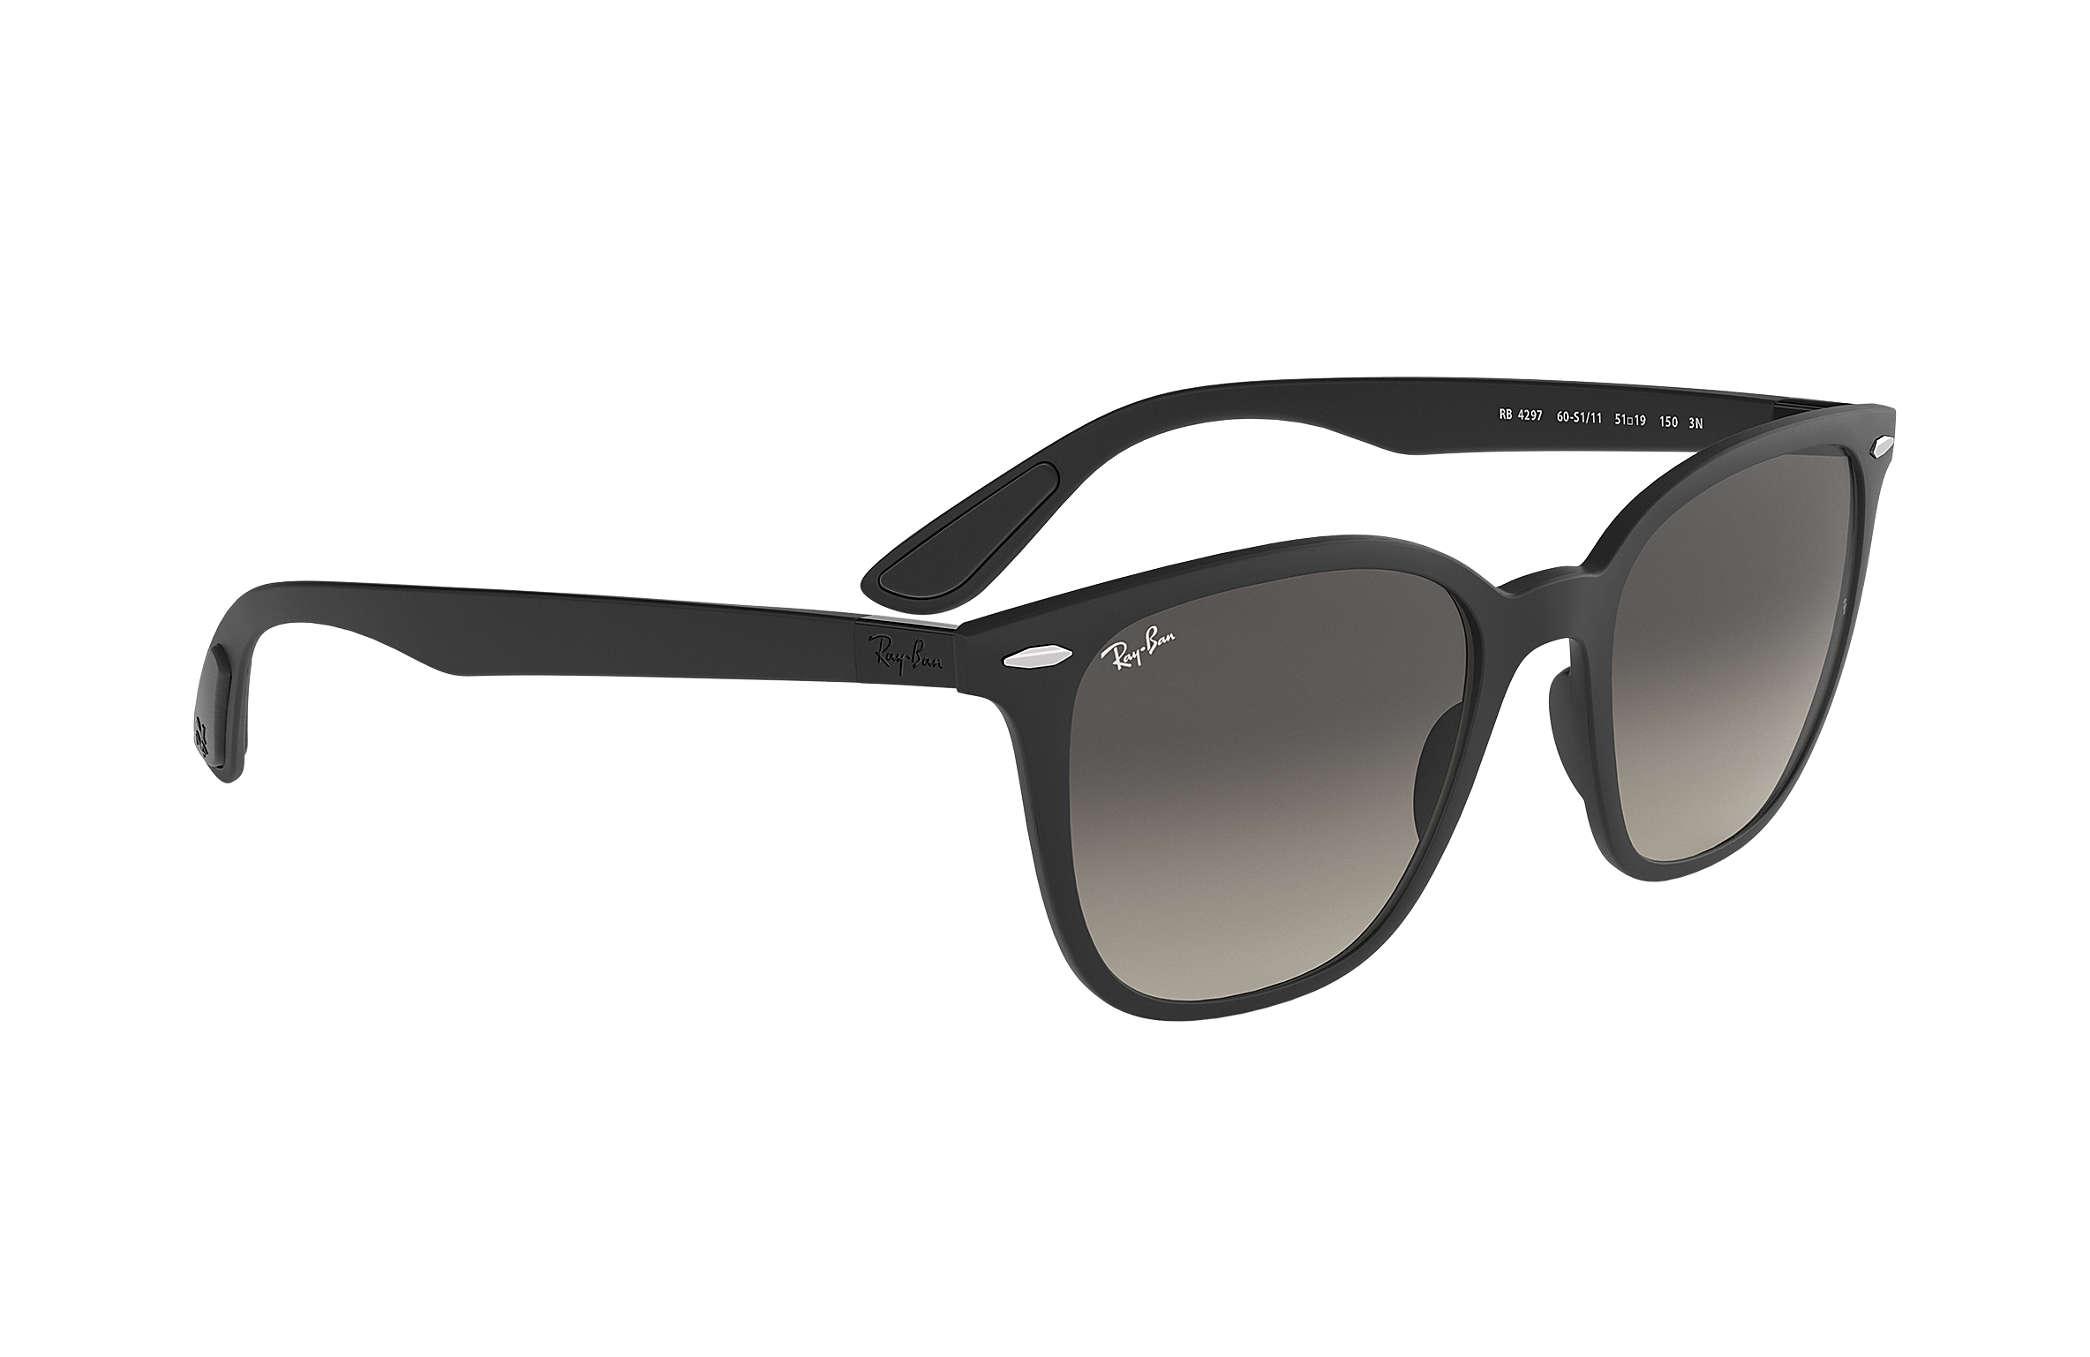 ac532882f3 Ray-Ban RB4297 Black - Peek - Grey Lenses - 0RB4297601S1151